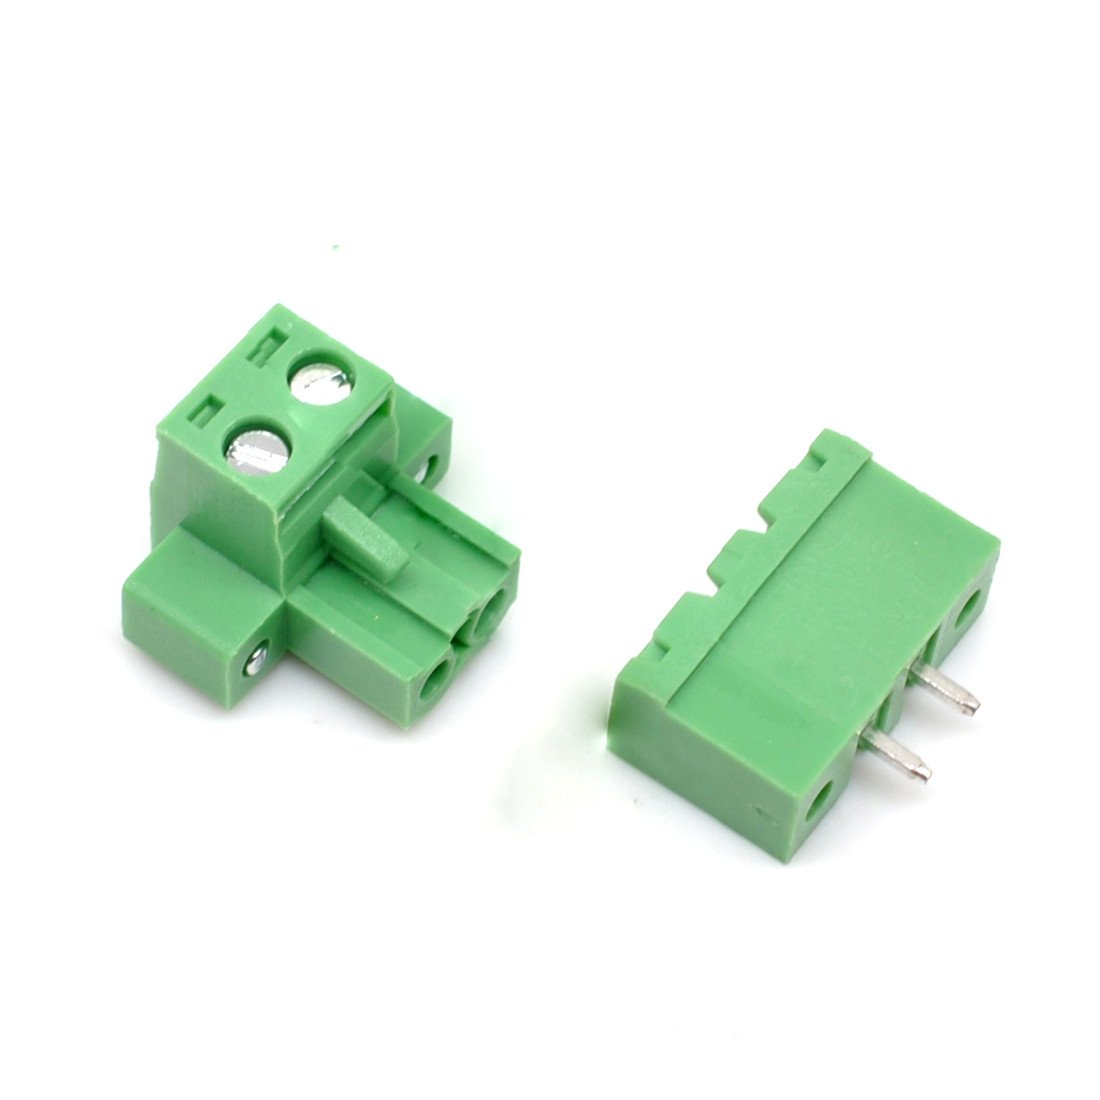 Willwin 20Pcs 5.08mm Pitch 3 Pin PCB Pluggable Terminal Blocks Connectors Green